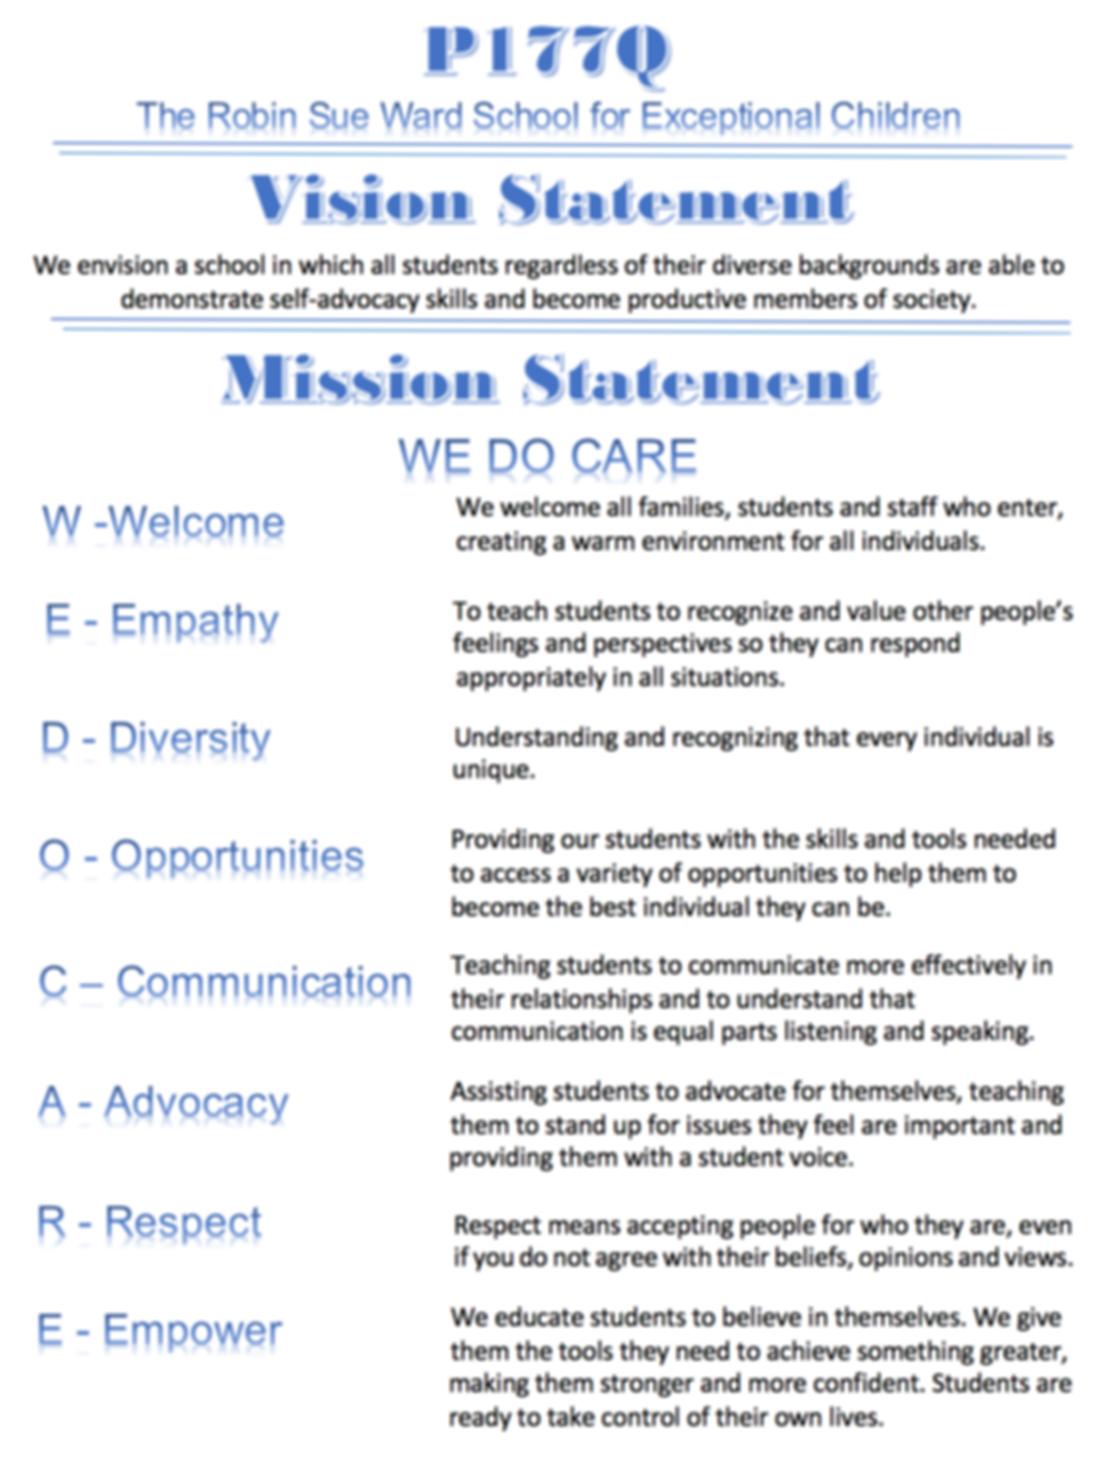 public school 177q mission and vision st